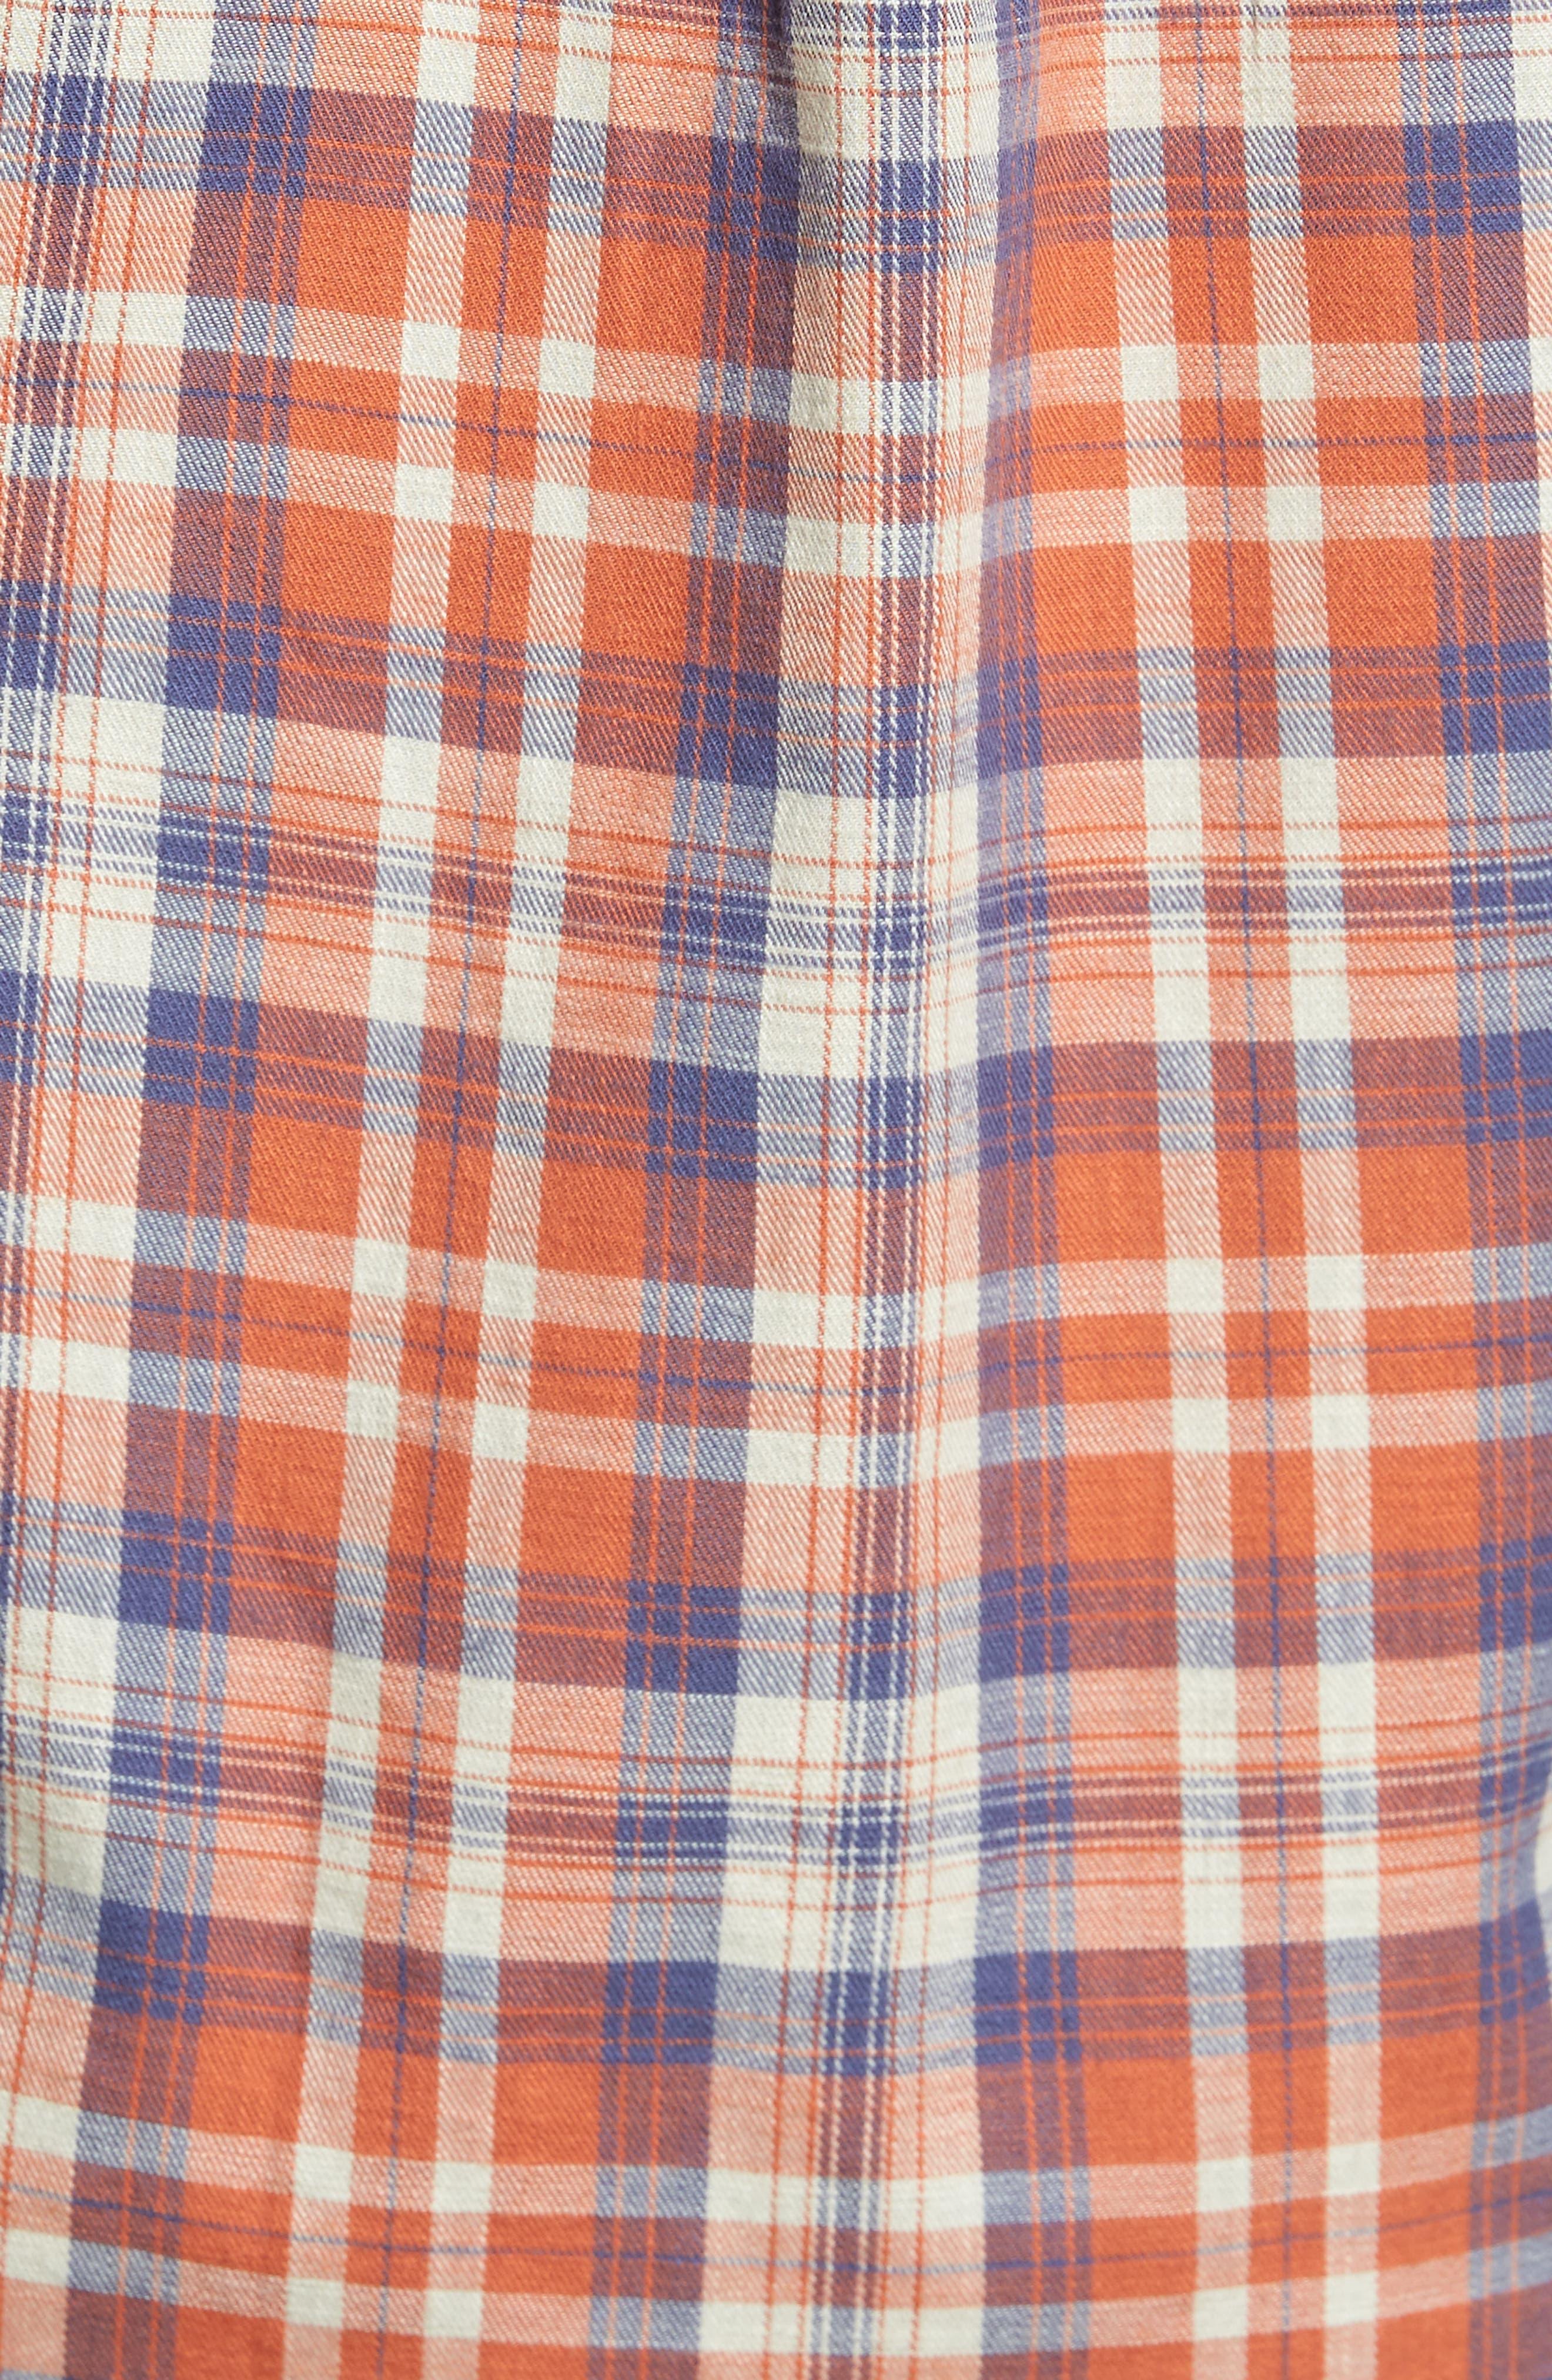 Scottsdale Slim Fit Plaid Slub Twill Sport Shirt,                             Alternate thumbnail 5, color,                             840